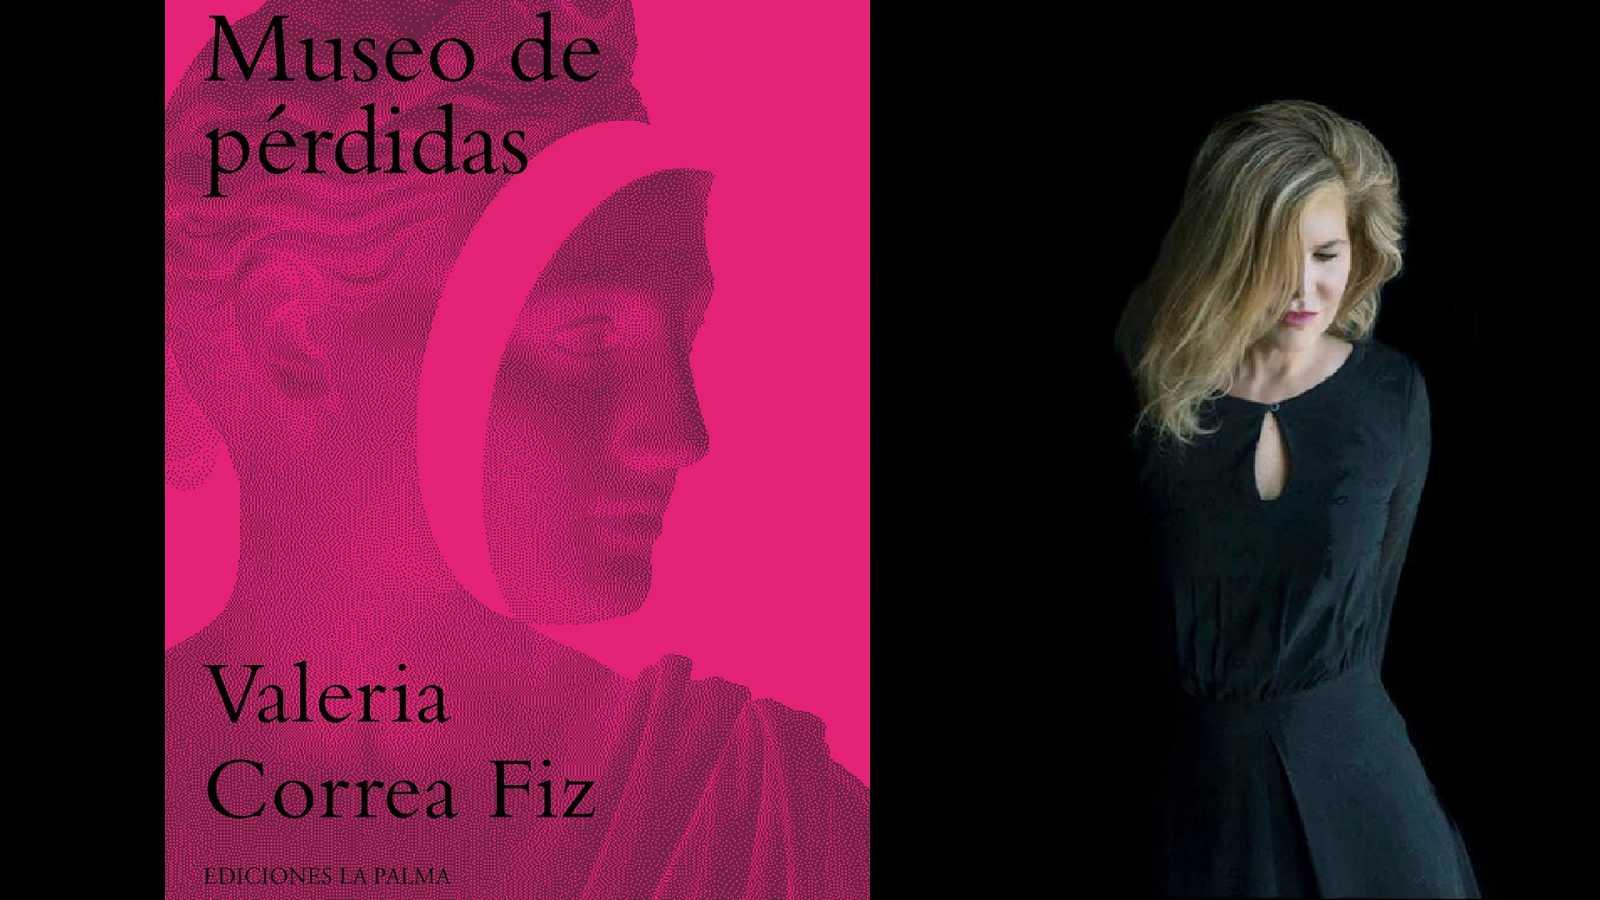 La LiBéLuLa - Museo de pérdidas (Valeria Correa Fiz, ed. La Palma) - 23/10/20 - escuchar ahora